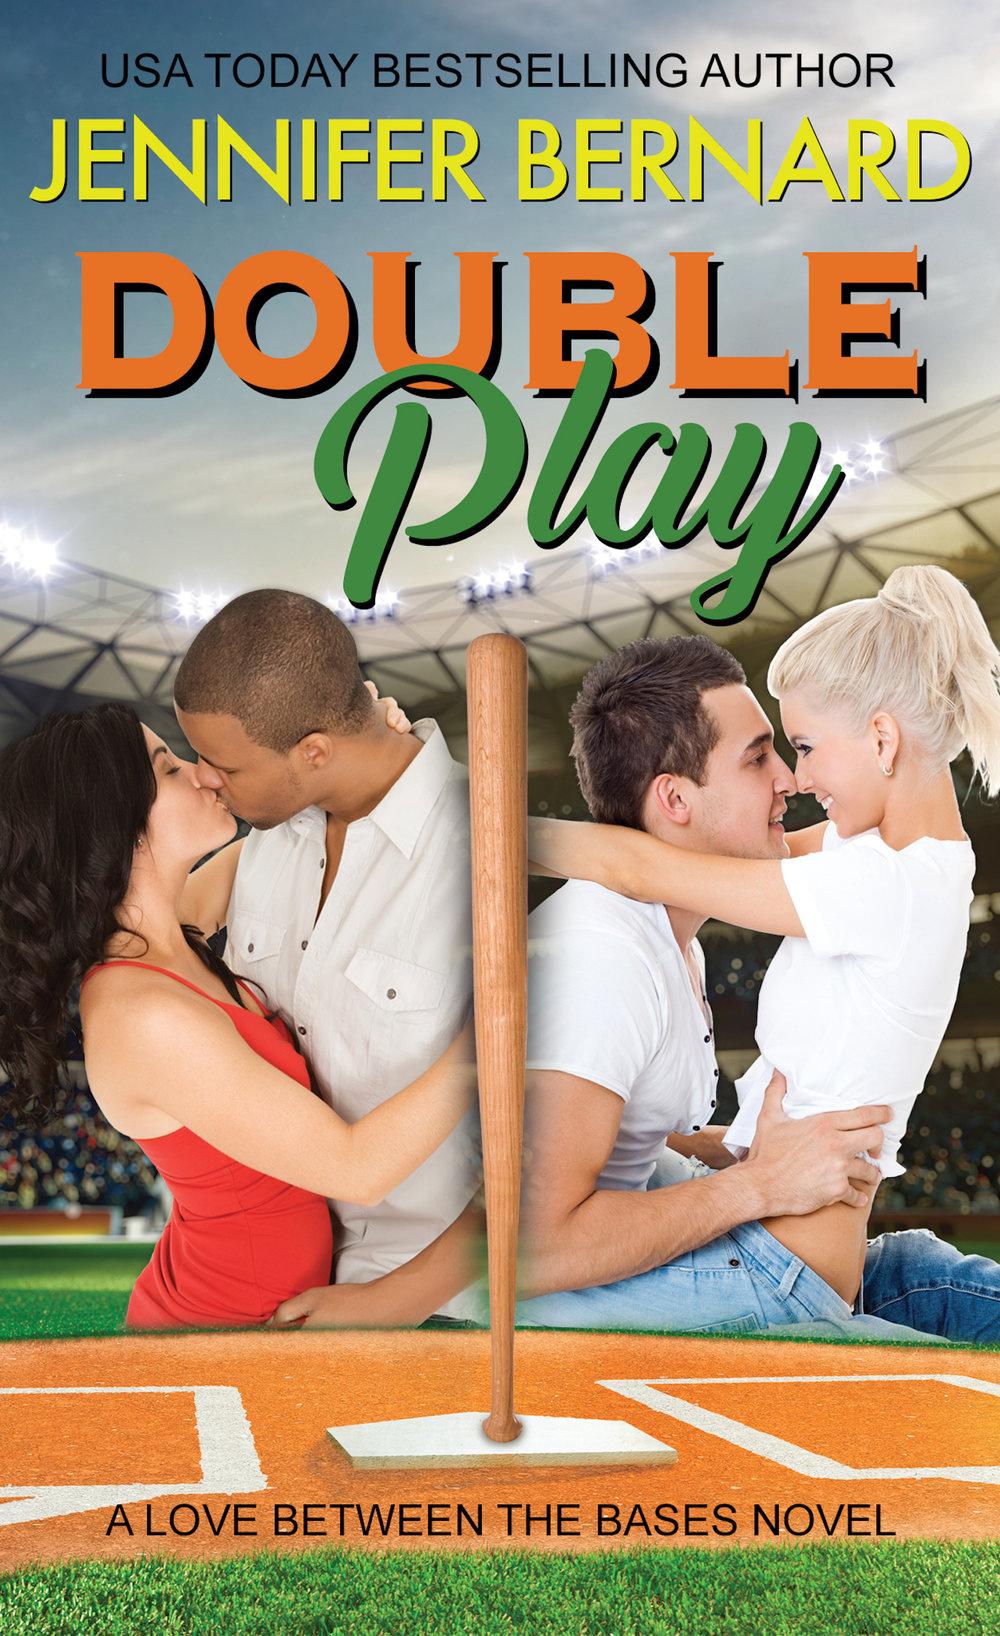 Double Play.FINAL.2500.jpg